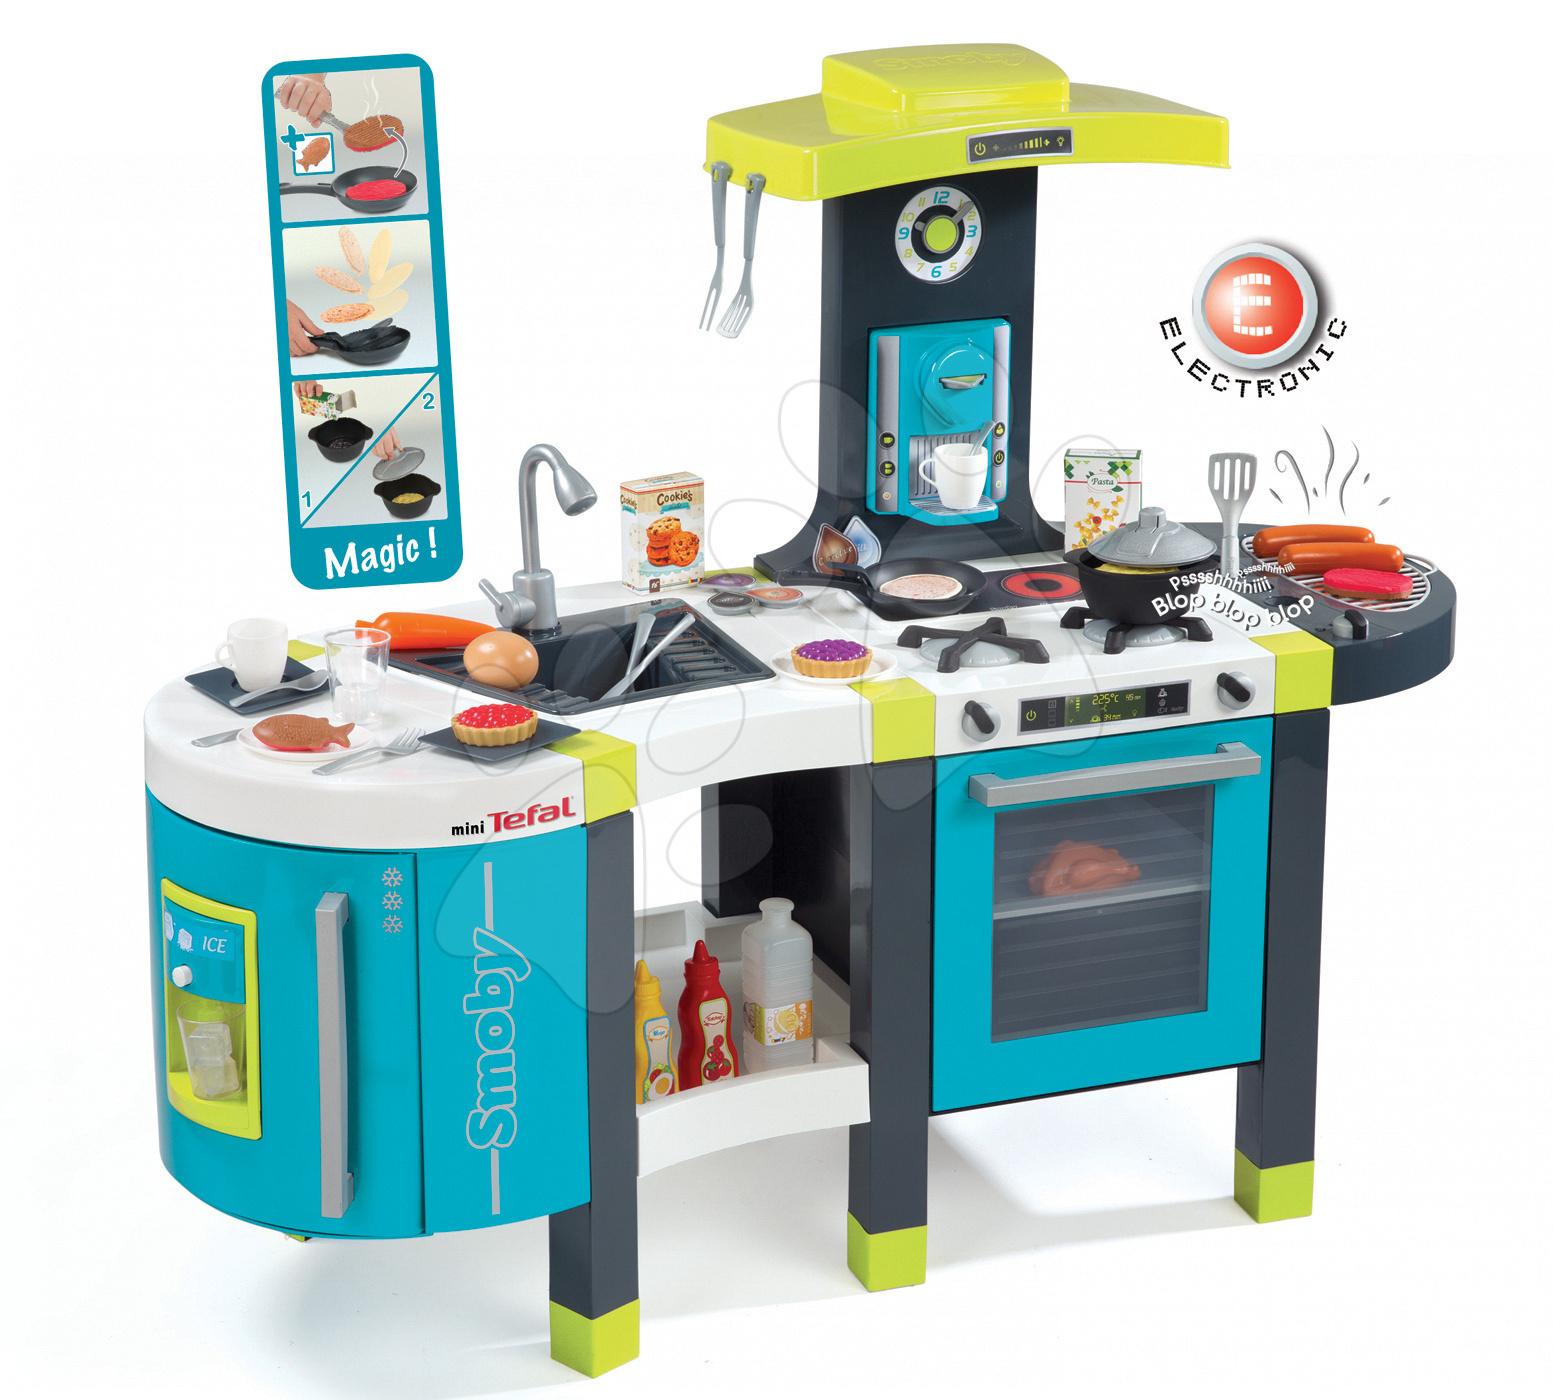 Elektronické kuchynky - Kuchynka Tefal French Touch Smoby elektronická so zvukmi, s ľadom, kávovarom a 45 doplnkami tyrkysovo-zelená